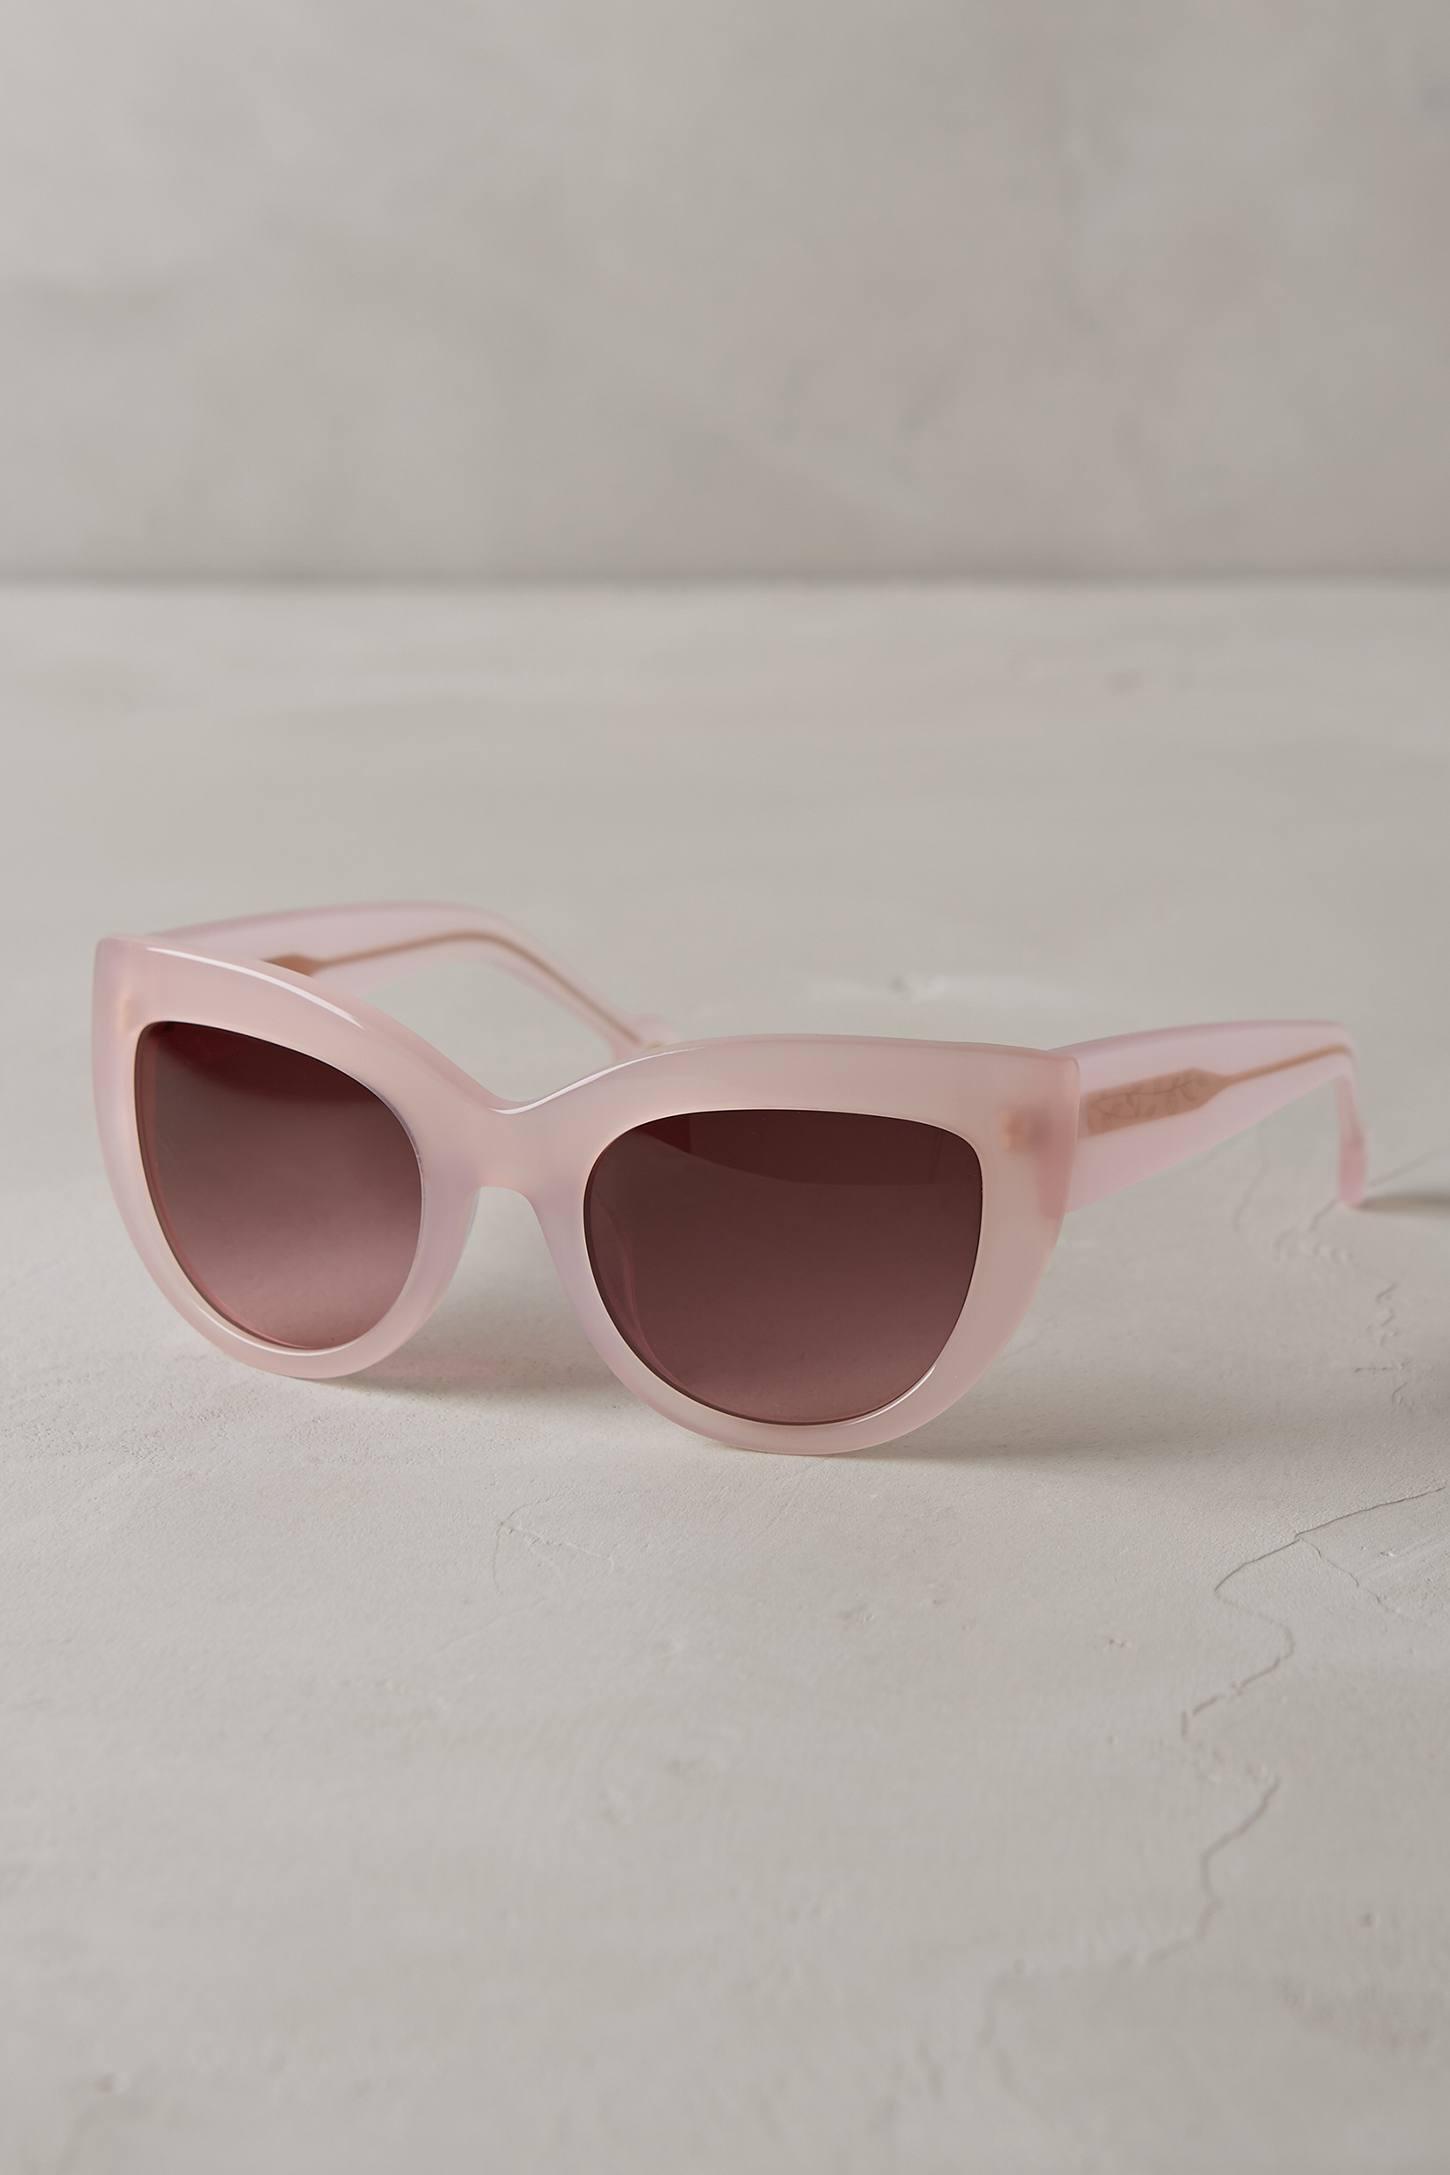 ett:twa Pink Archetype Sunglasses (image via lyst.com)